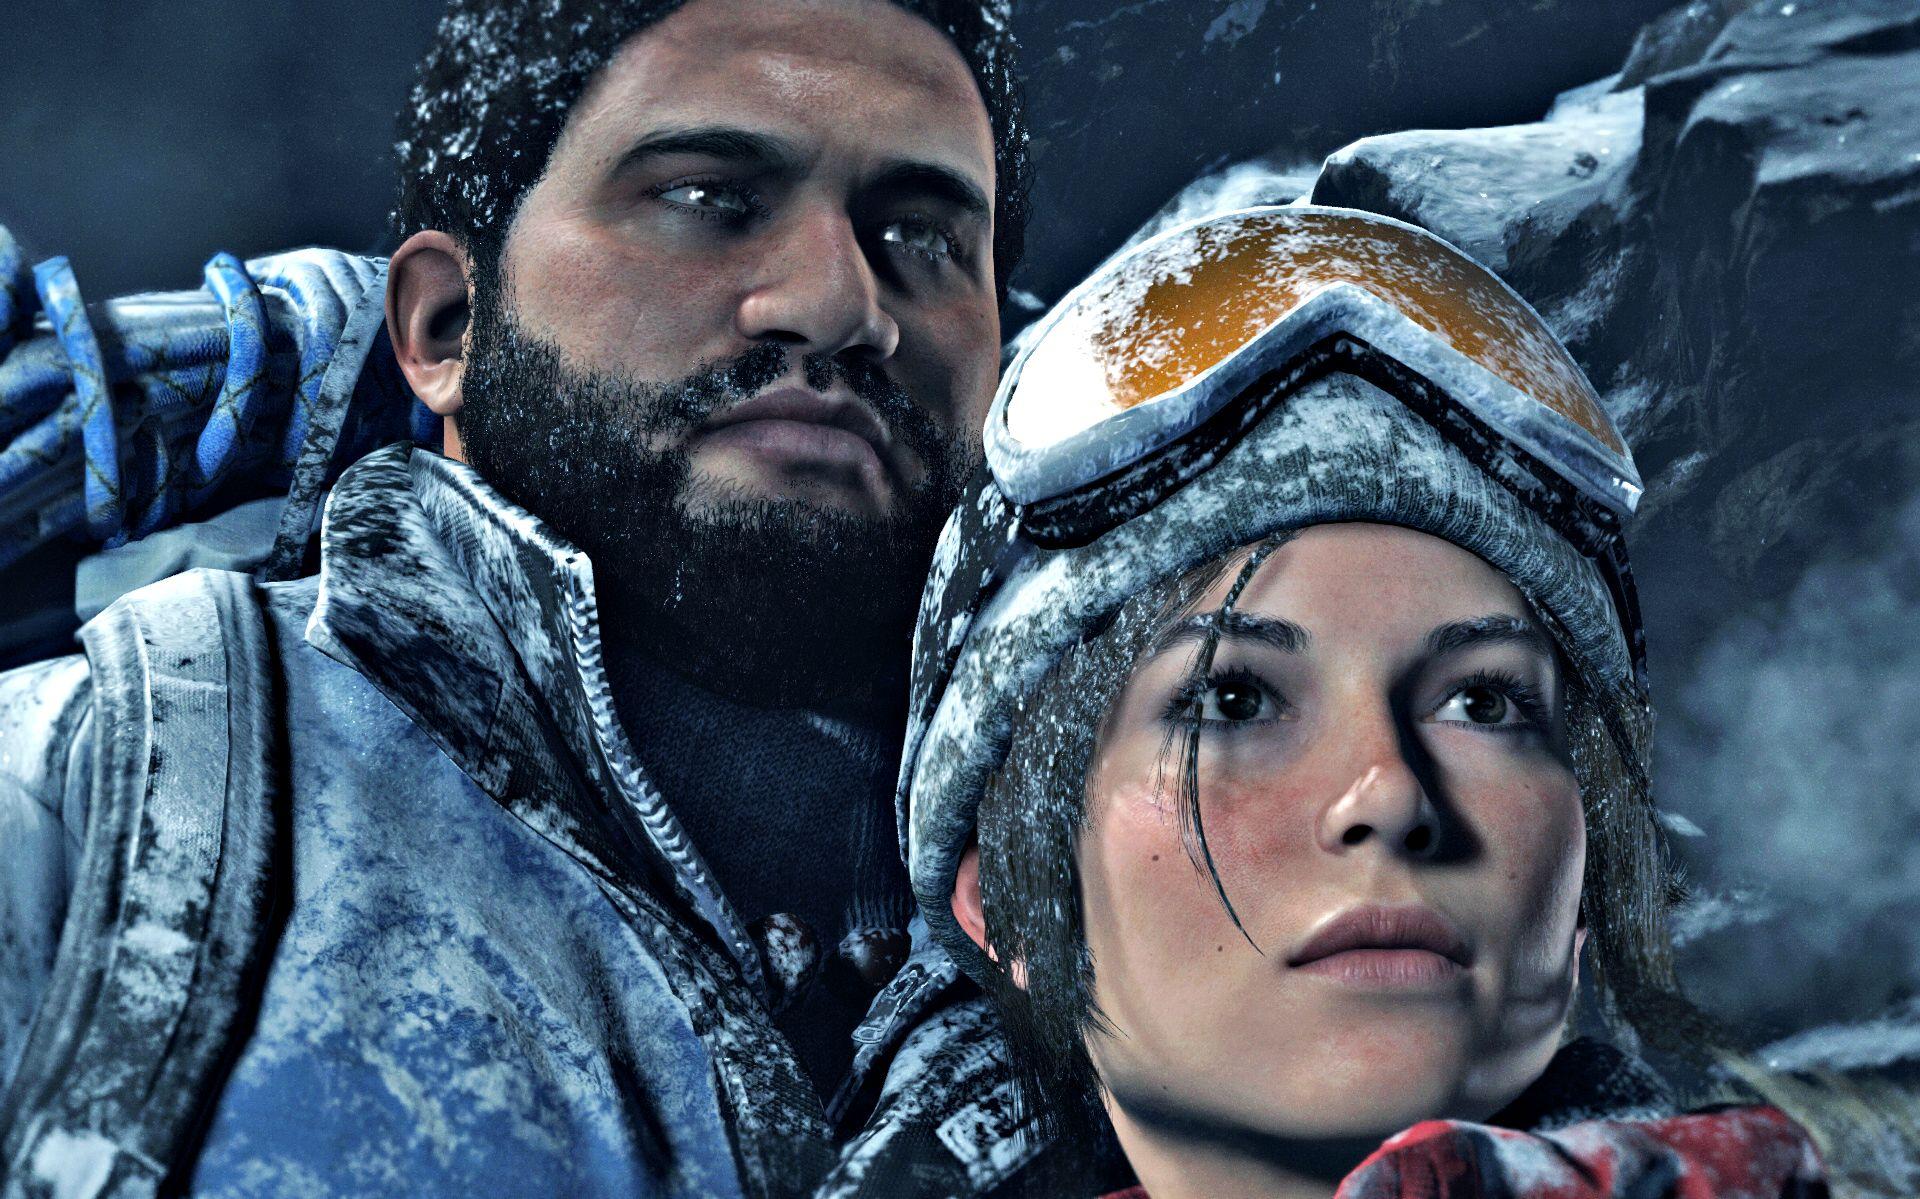 Jonah and Lara